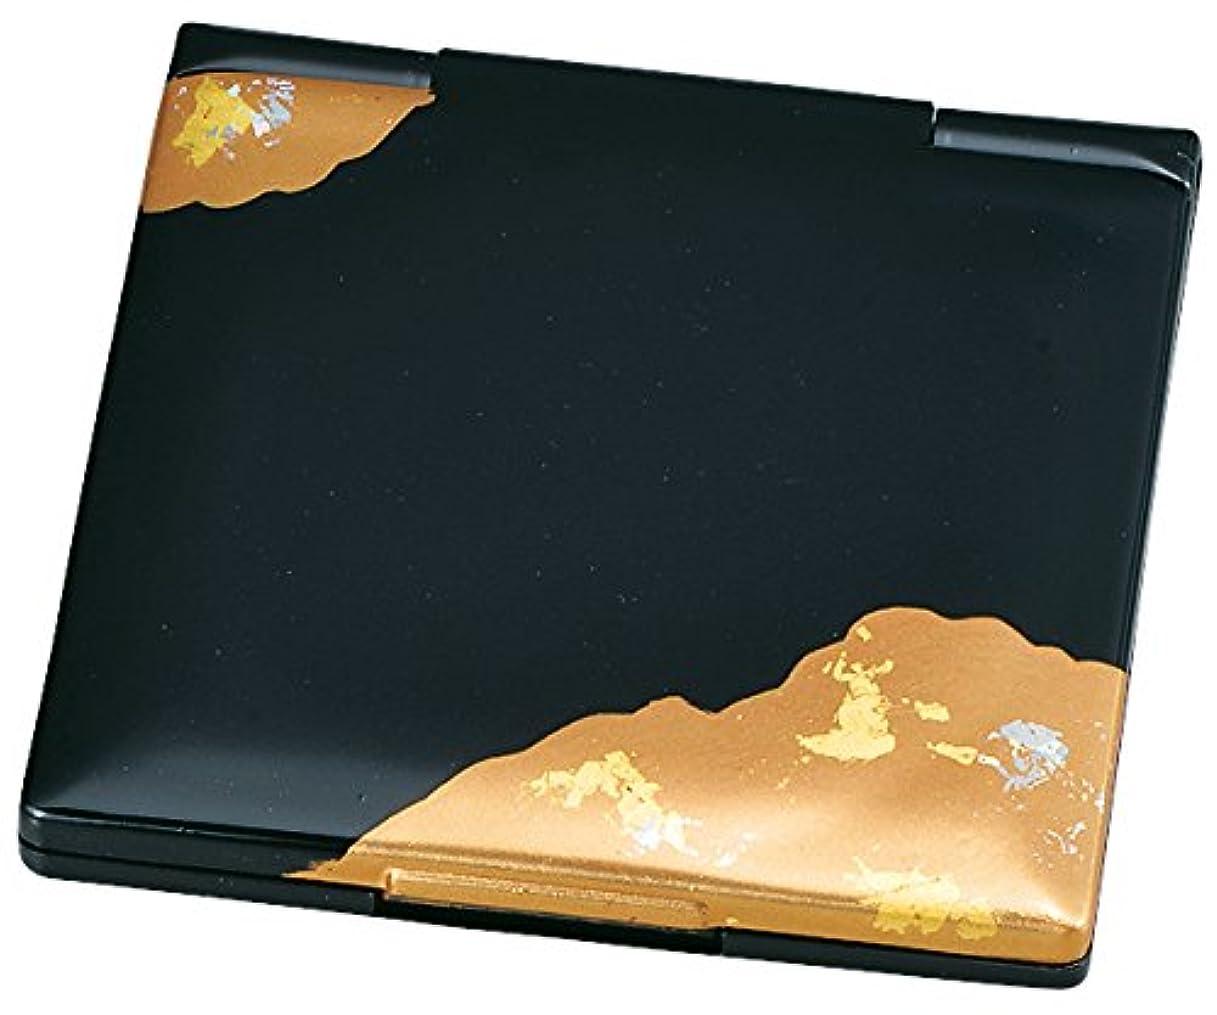 脱走東部異邦人中谷兄弟商会 山中漆器 コンパクトミラー 純金箔工芸 黒 金雲33-0401